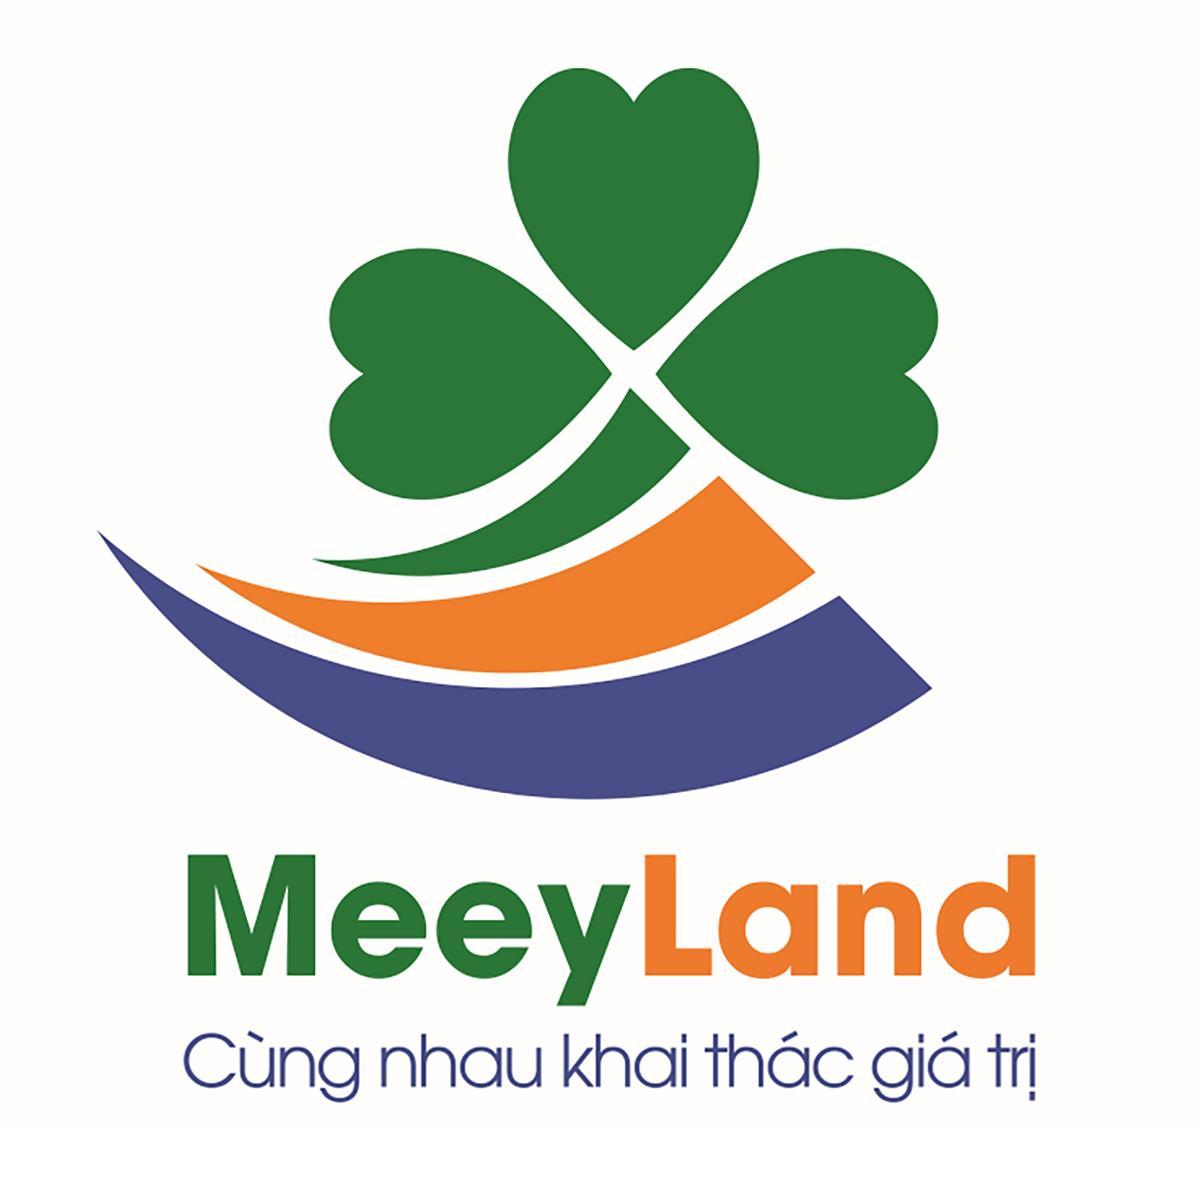 Meeyland